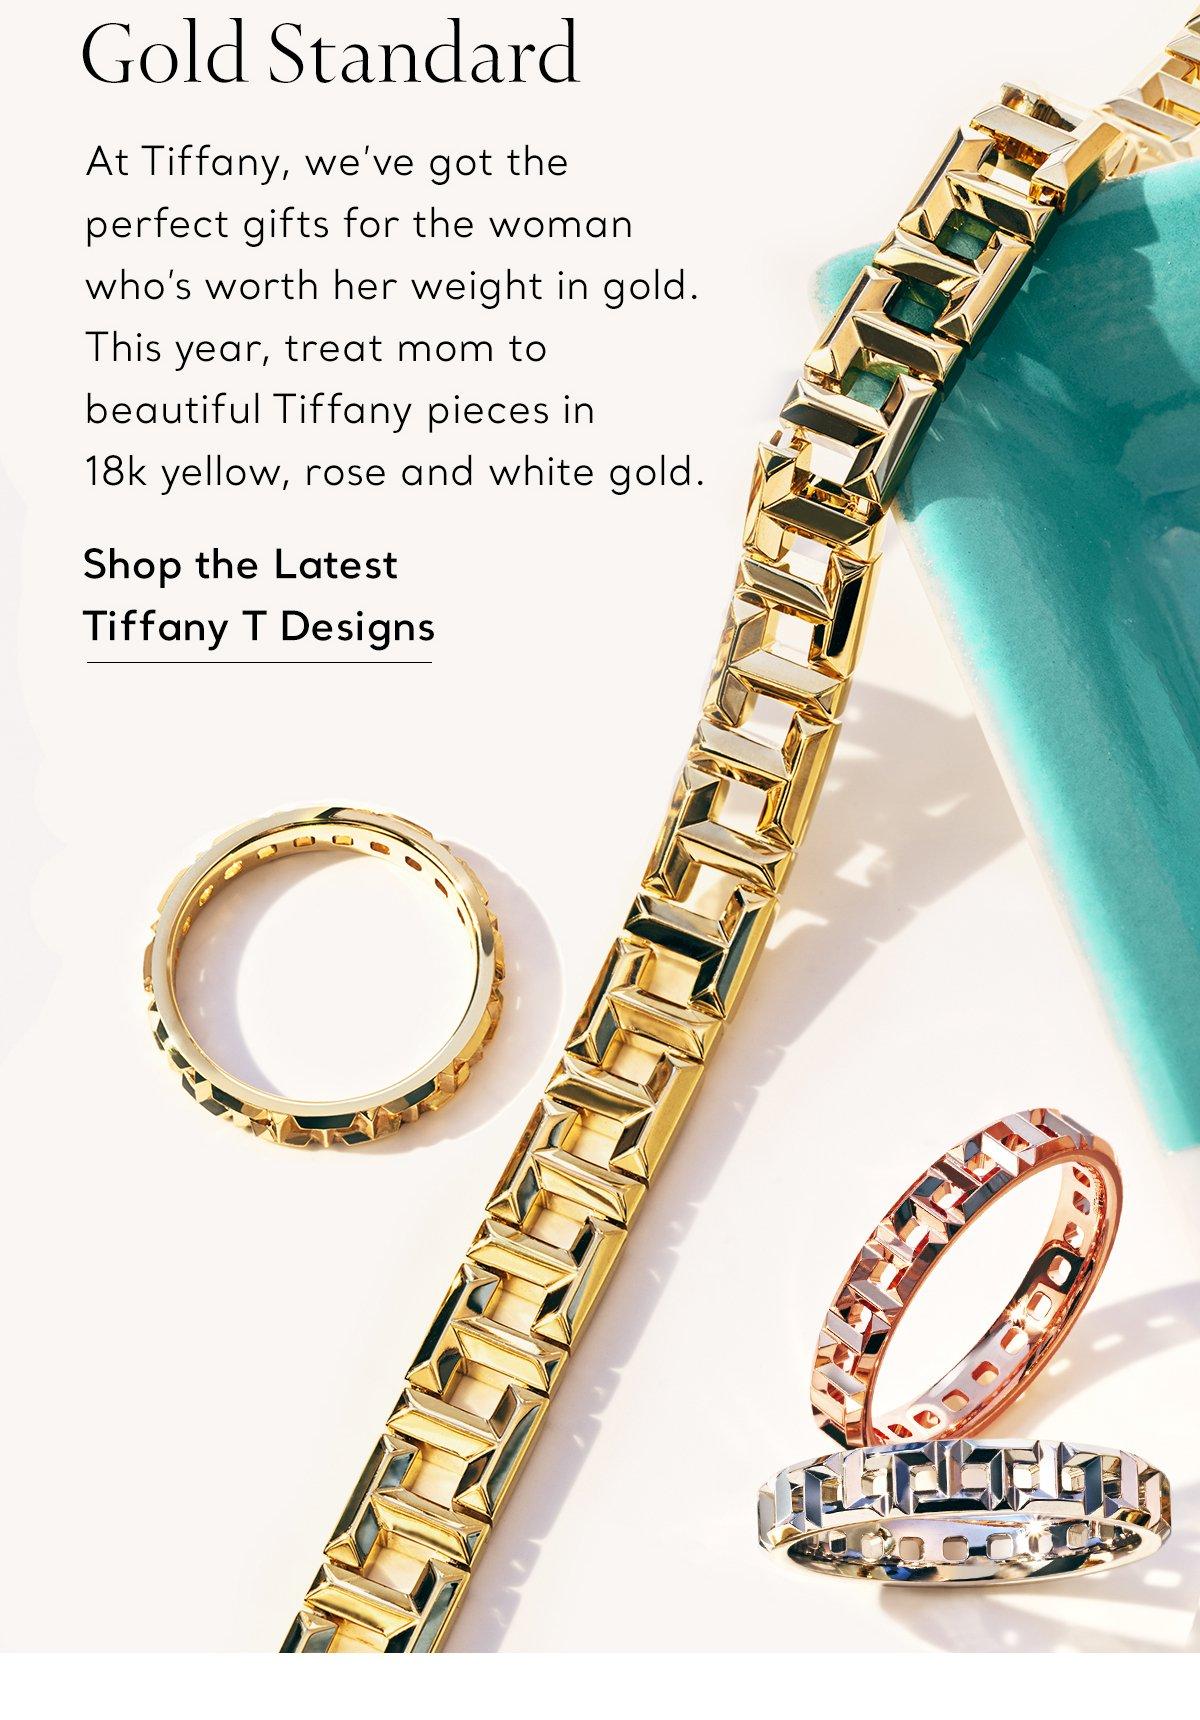 Shop the Latest Tiffany T Designs